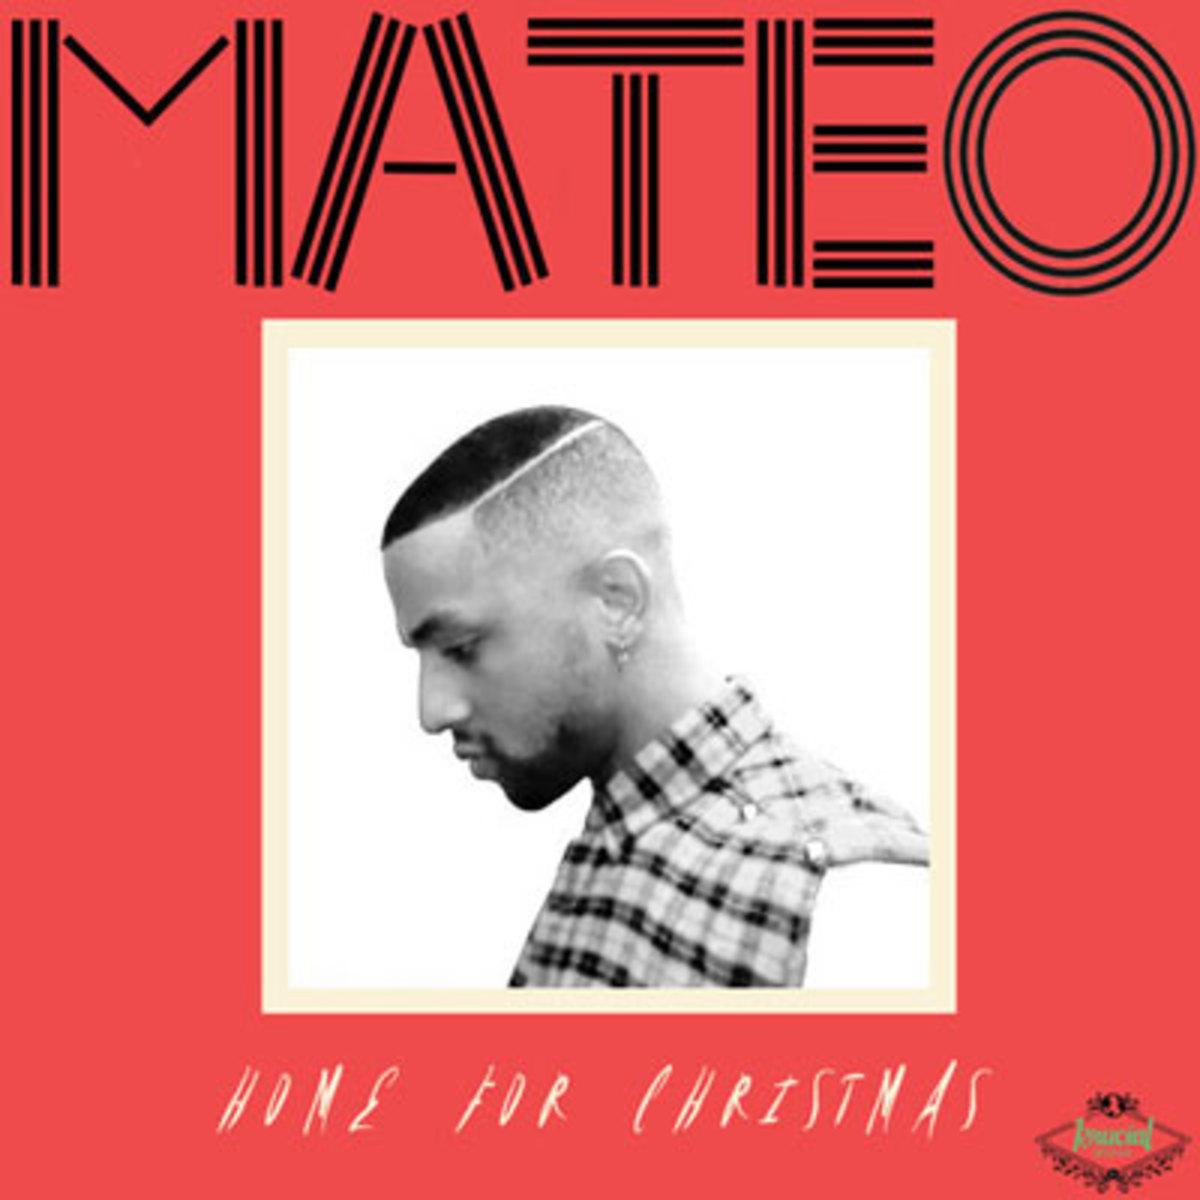 mateo-homeforchristmas.jpg